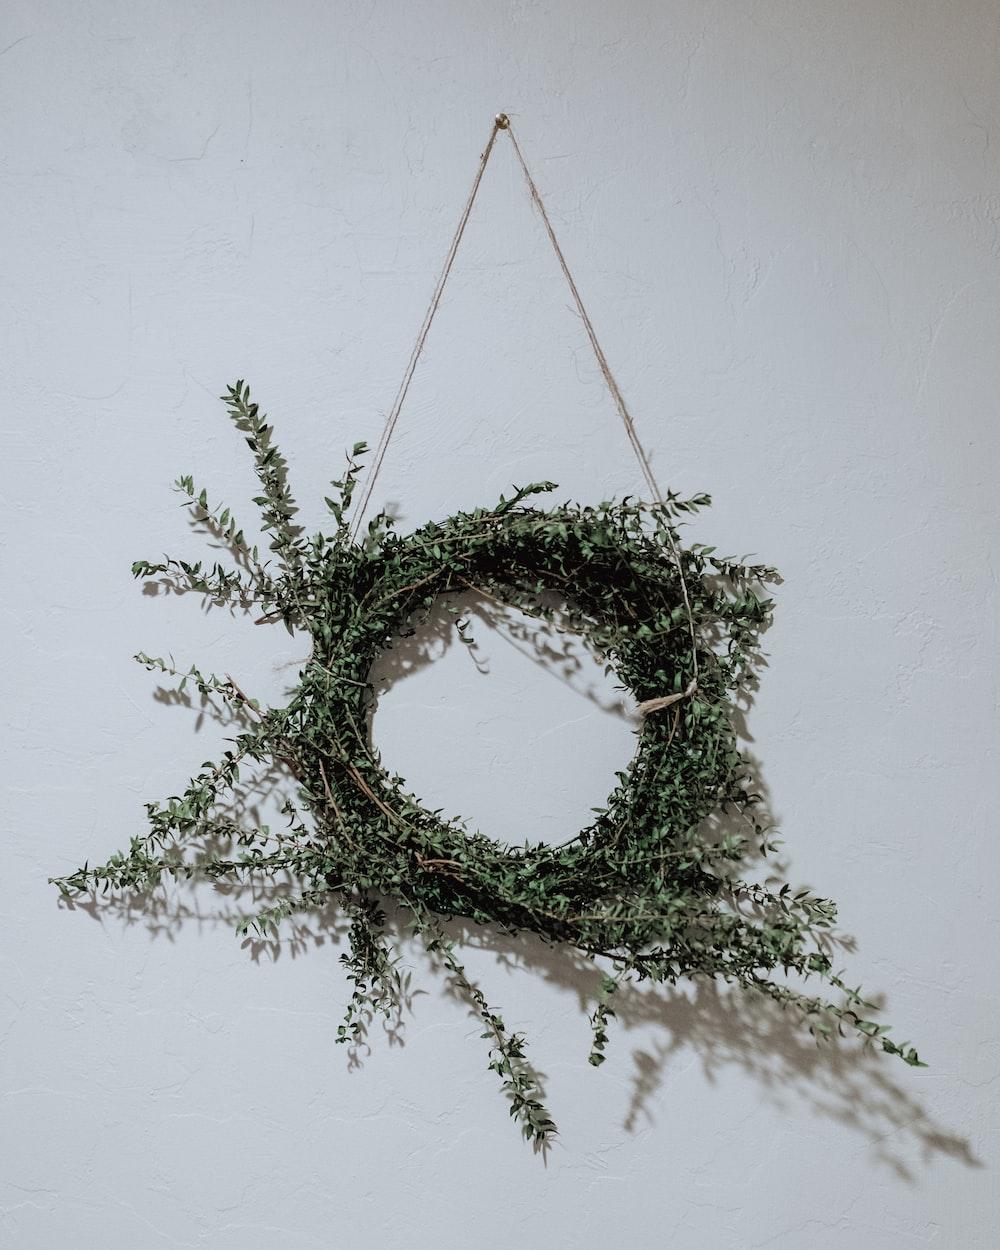 green leafed wreath on wall